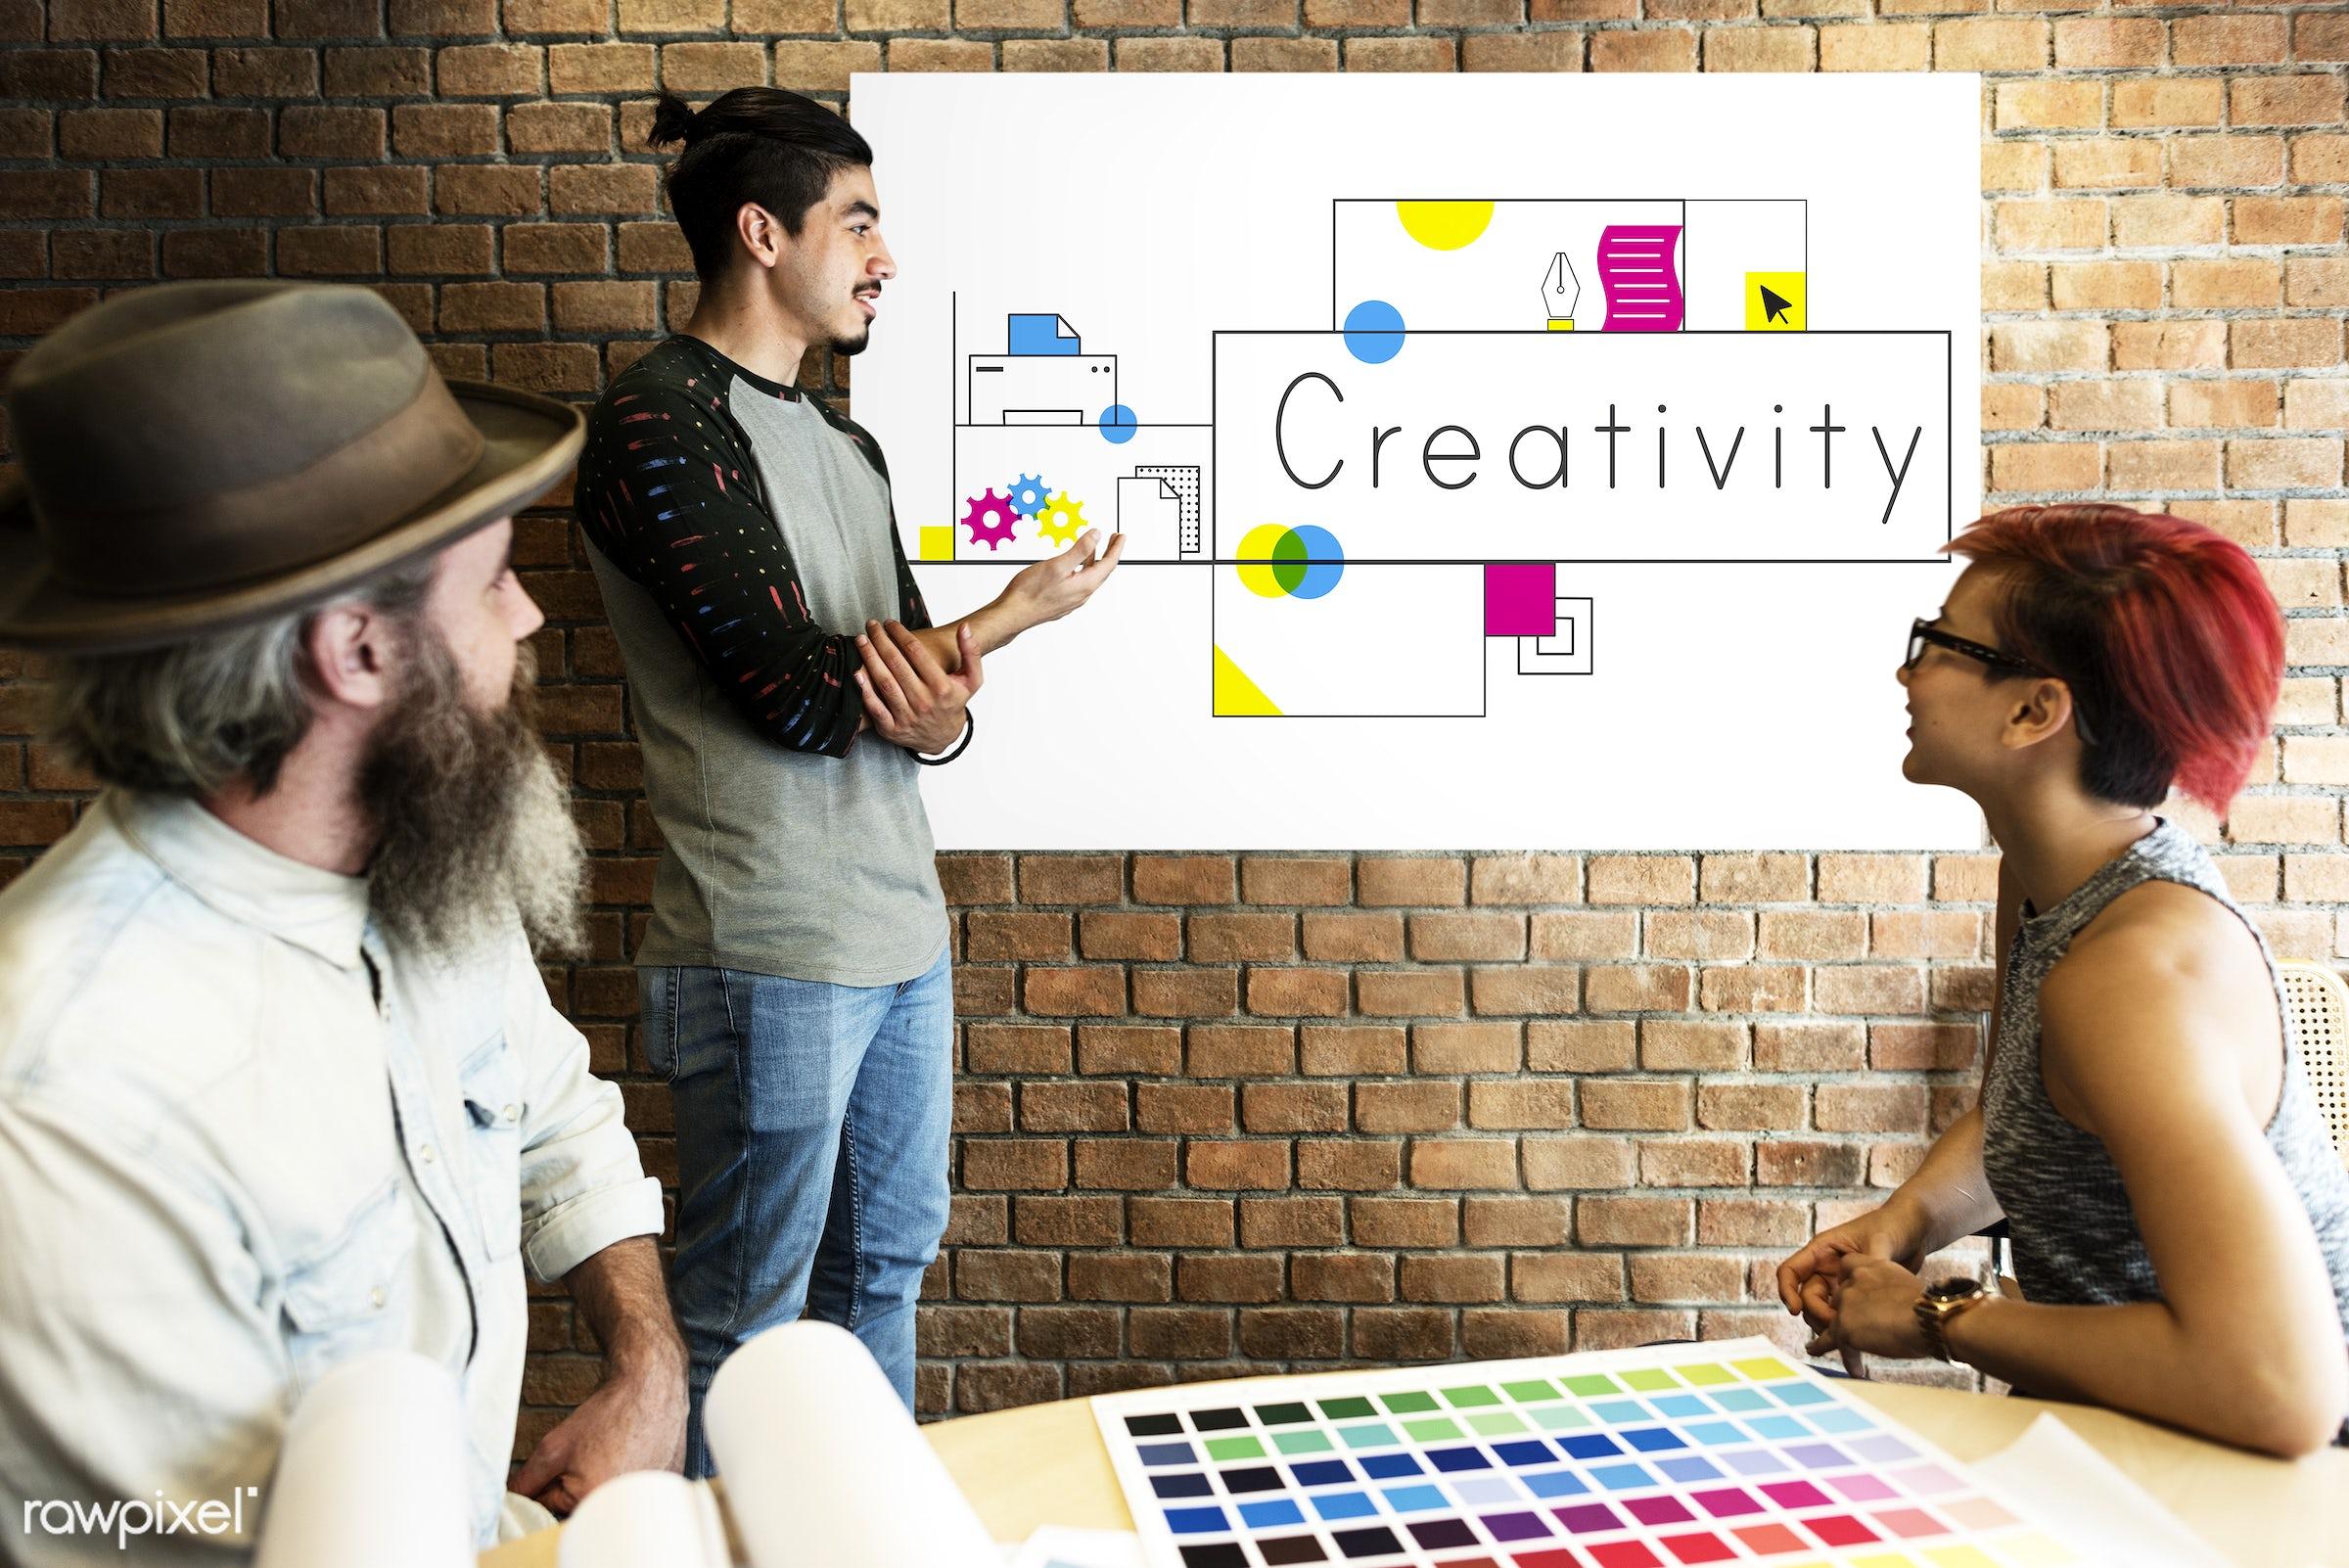 art, beard, board, brick wall, chart, cmyk, color chart, colors, creative, creativity, design, discussion, female, graphic,...